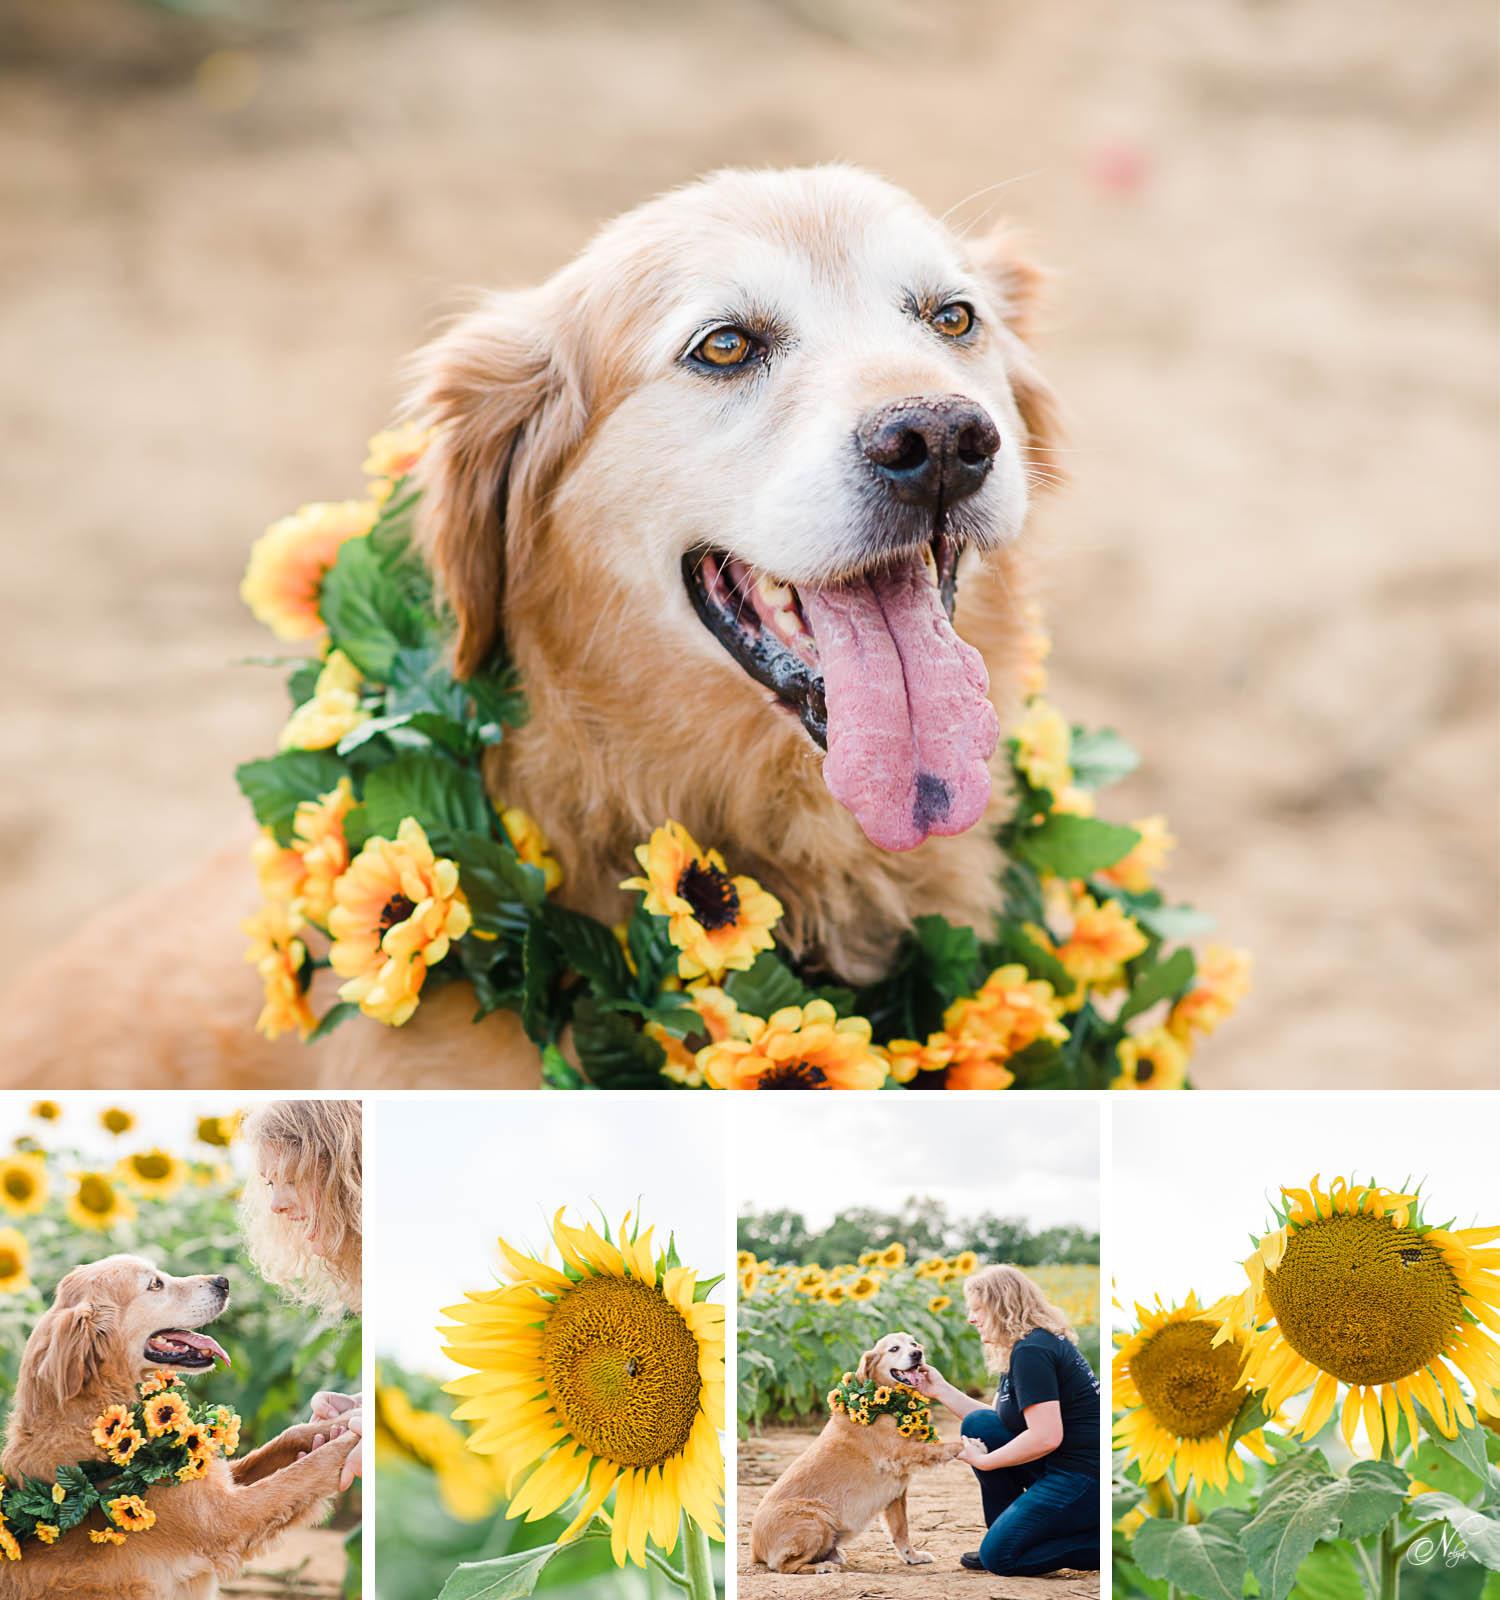 Adorable sunflower and dog photos